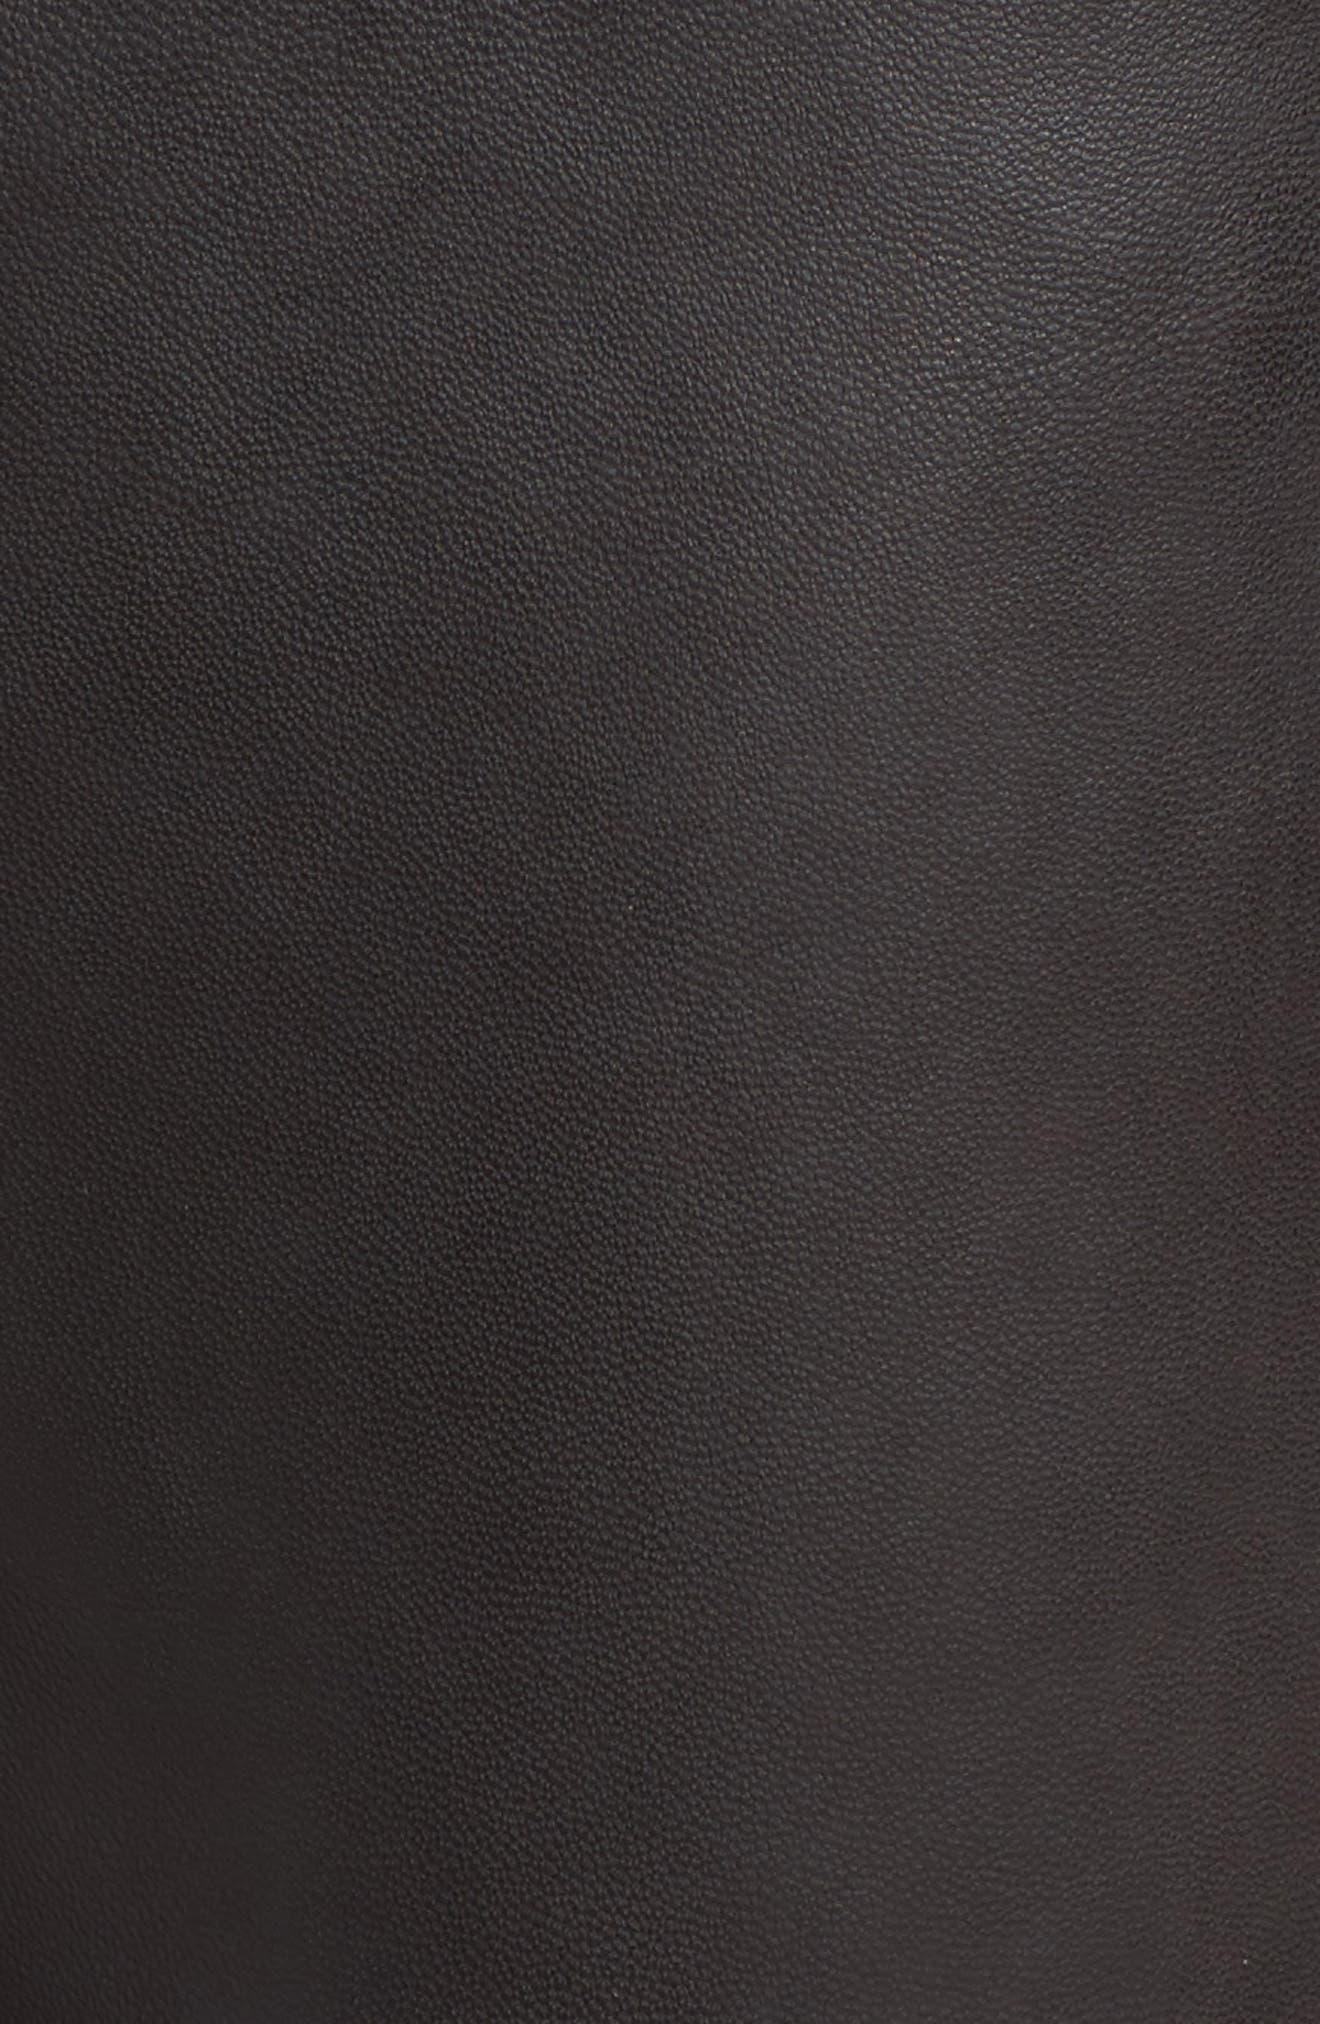 Crop Flare Leather Pants,                             Alternate thumbnail 5, color,                             001